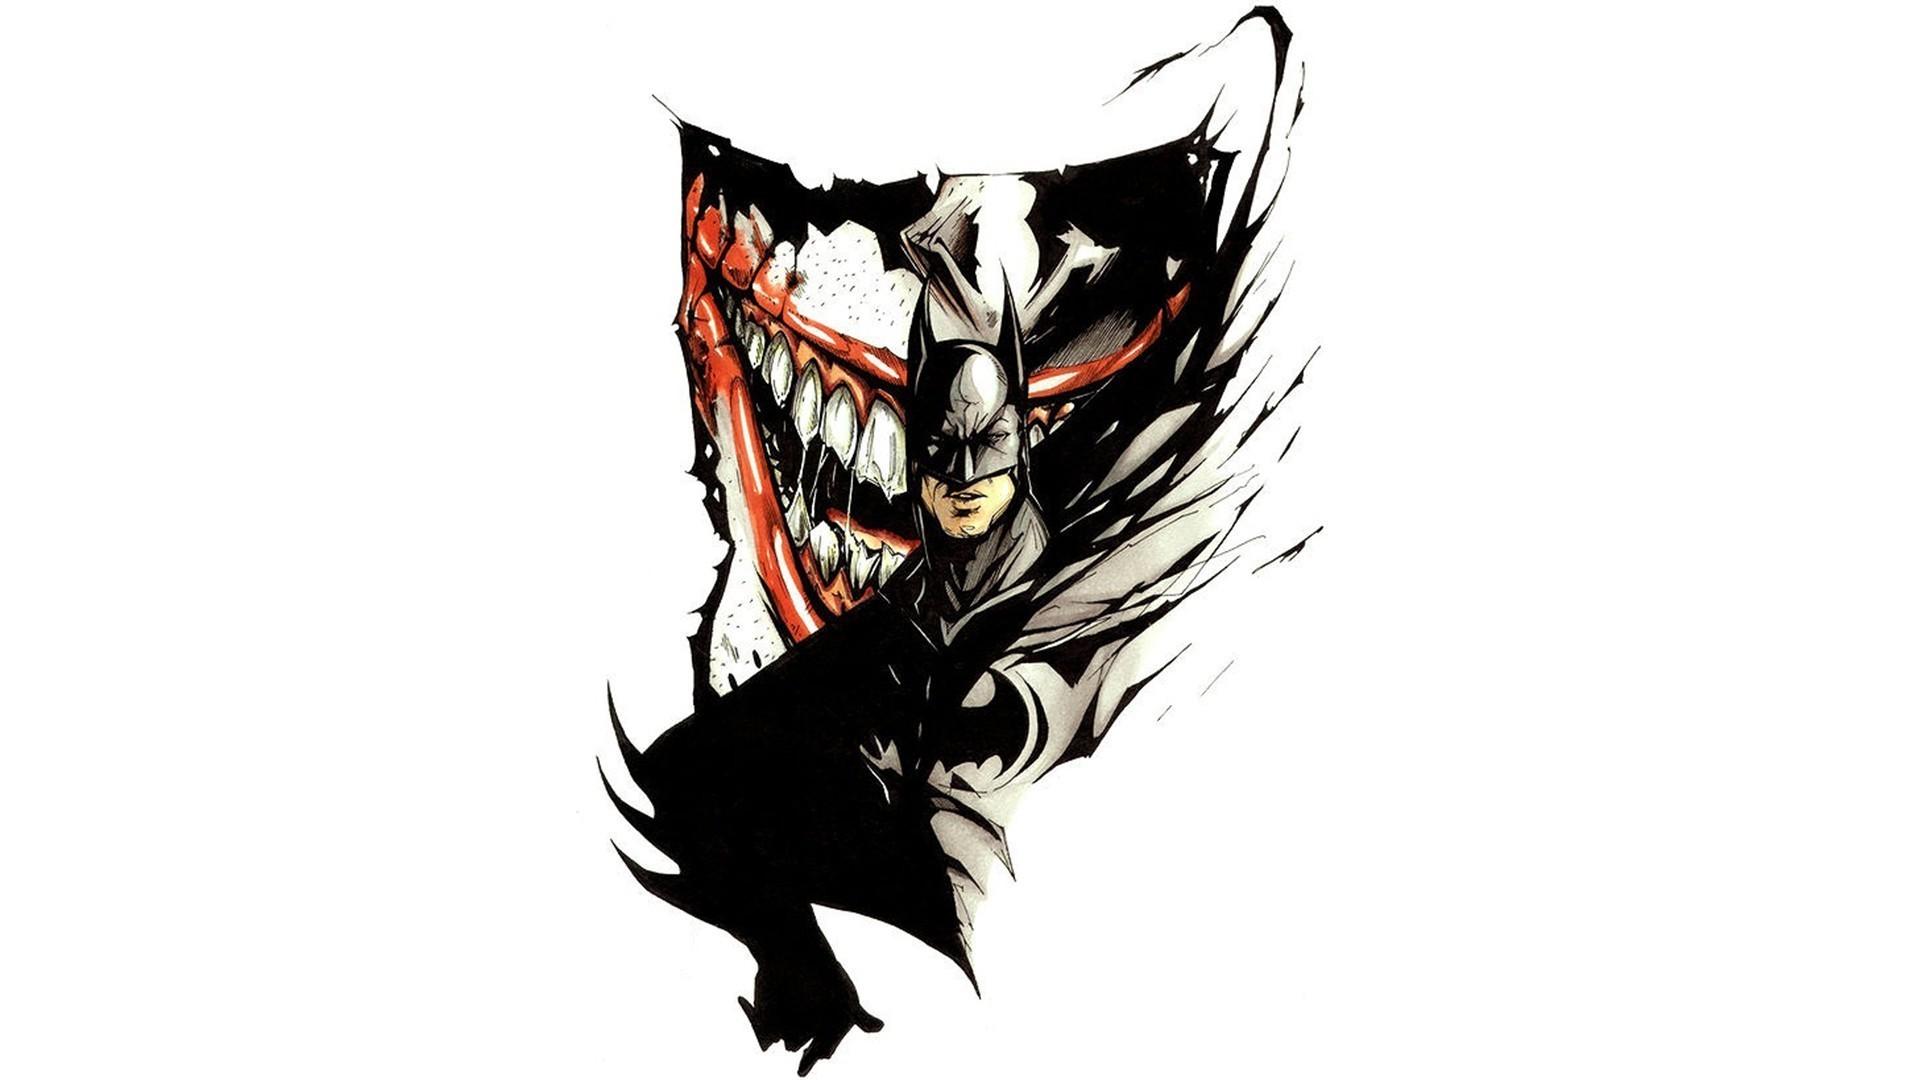 Gambar Animasi Joker Hd